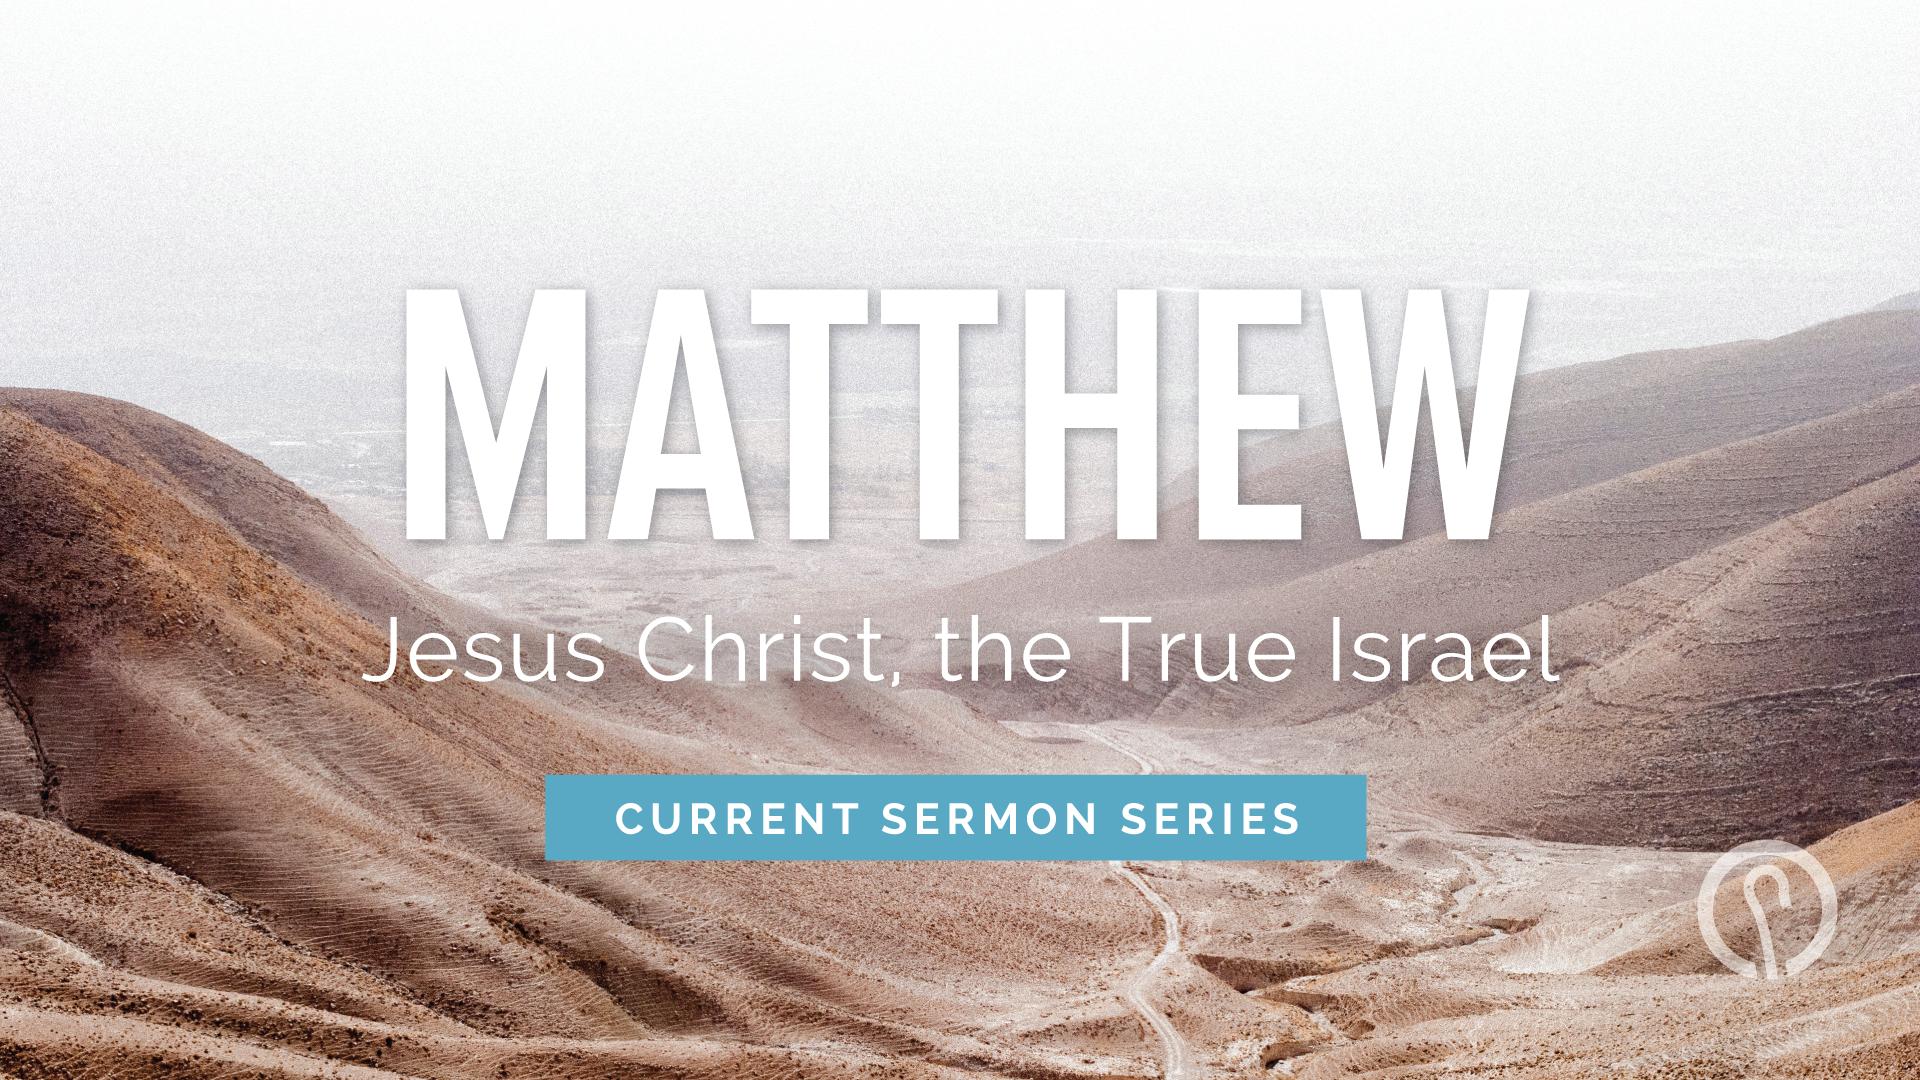 Your Word is Your Bond - Matthew 5:33-37